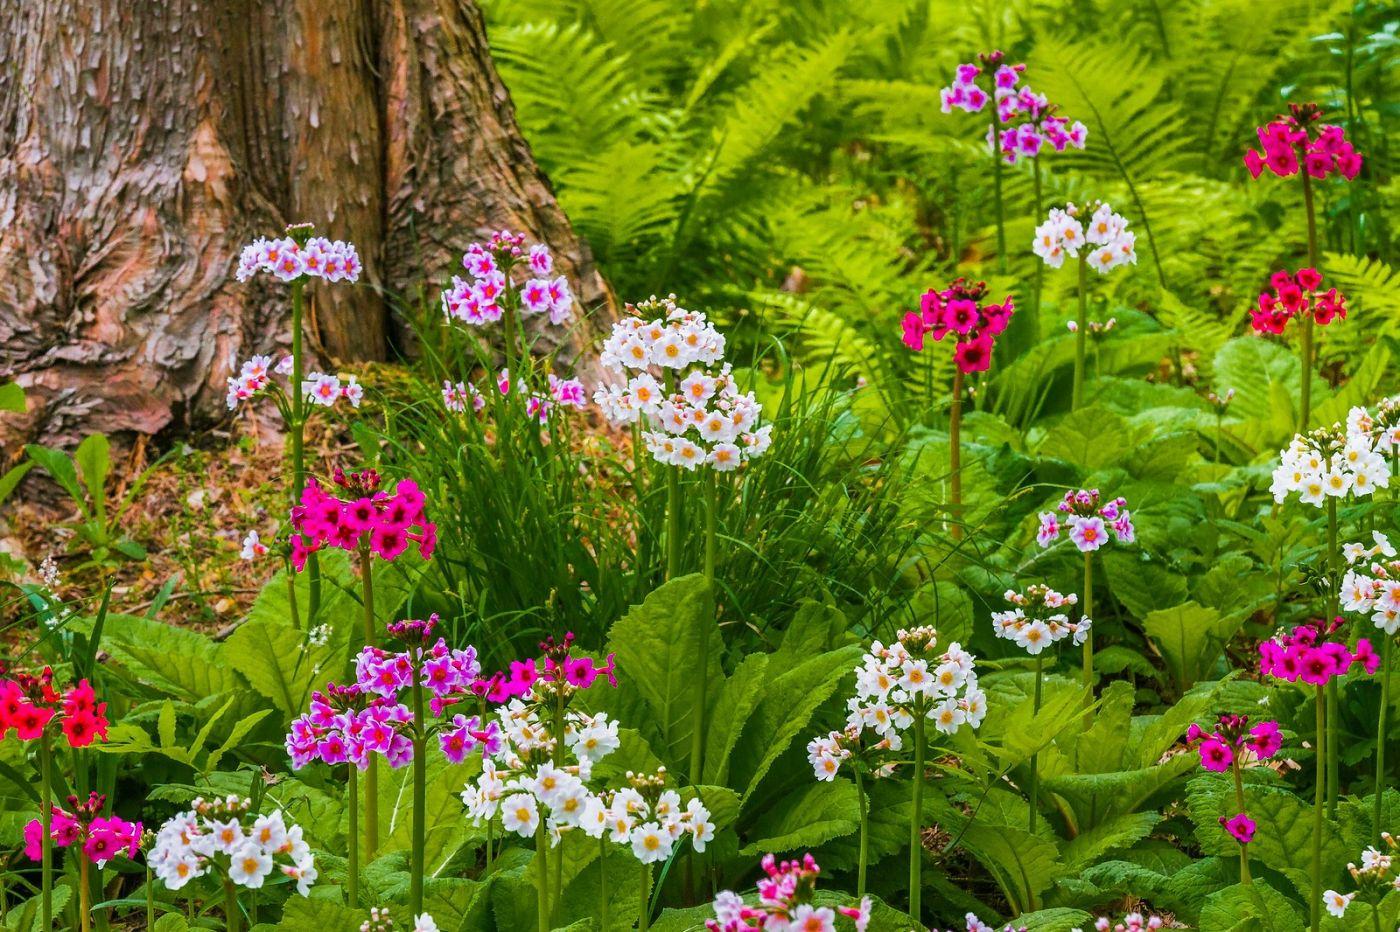 Chanticleer花园,有梦想的季节_图1-37